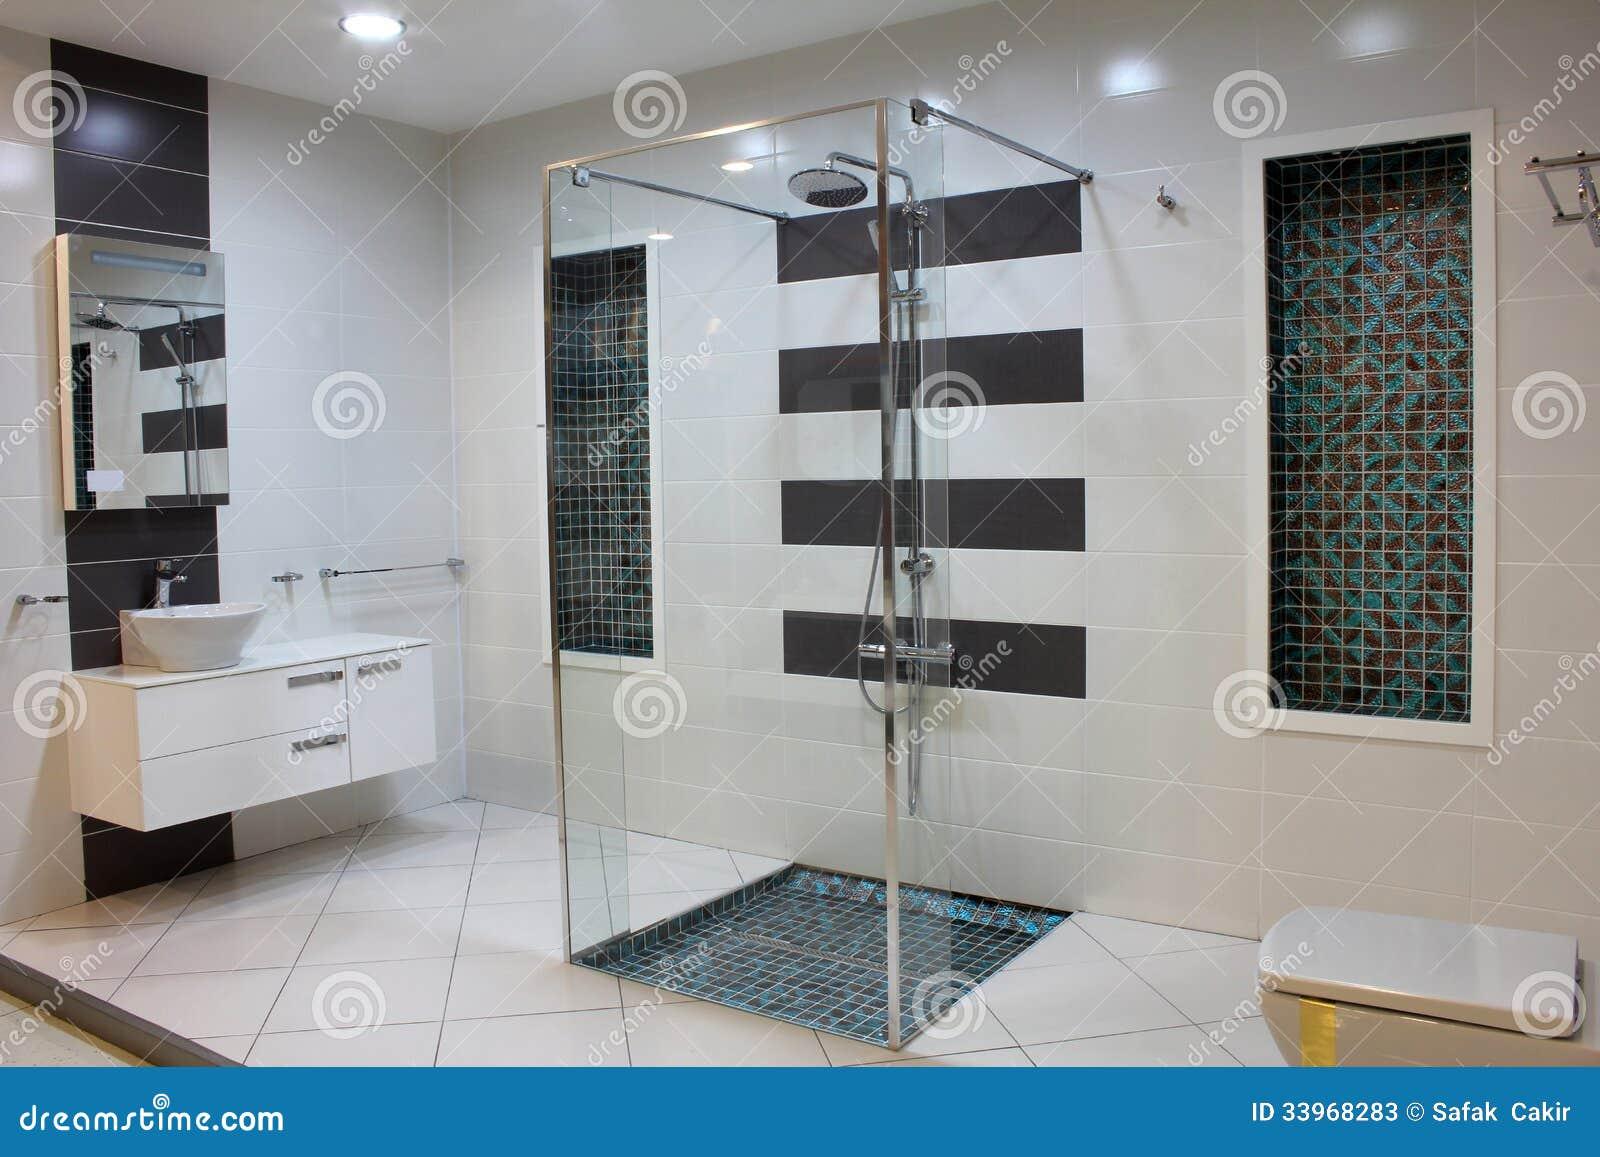 Bathroom Stock Image Image Of Faucet Bathroom Granite